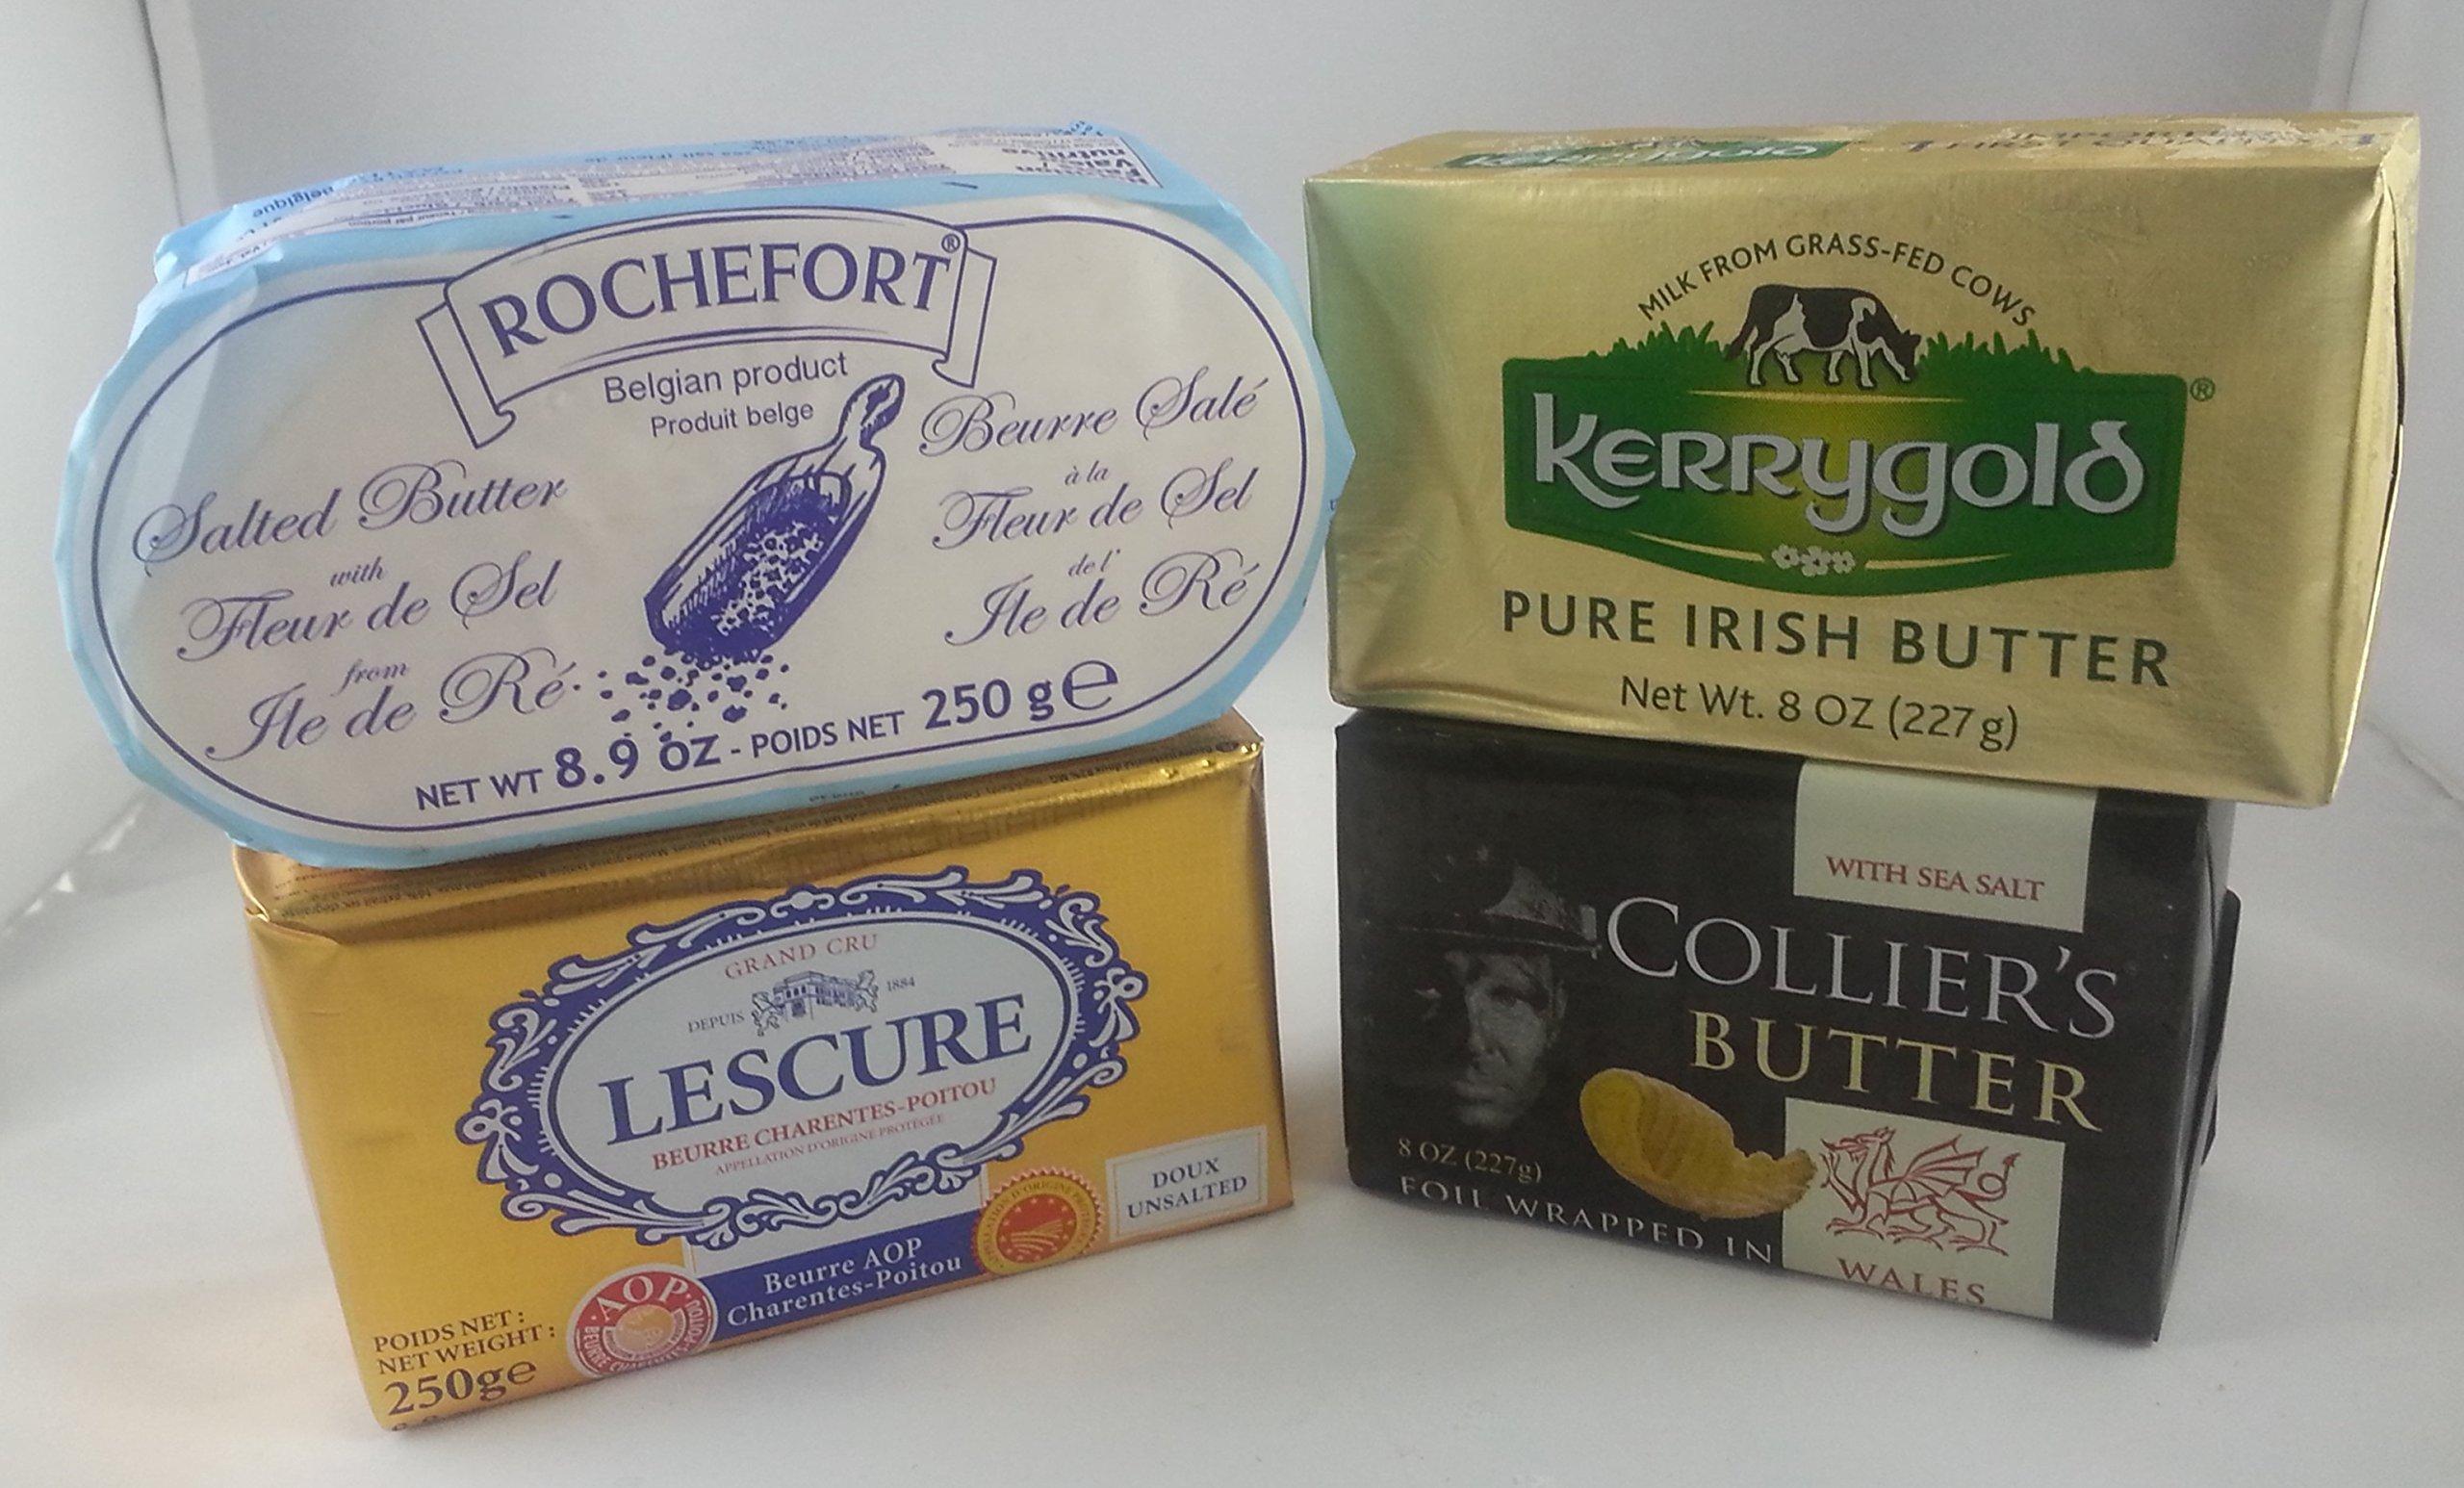 European Butter Set. (4 butters). Kerrygold Irish (8 oz), Rochefort Belgian (8.9 oz), Lescure French (8.9 oz), Collier's Wales (8 oz)